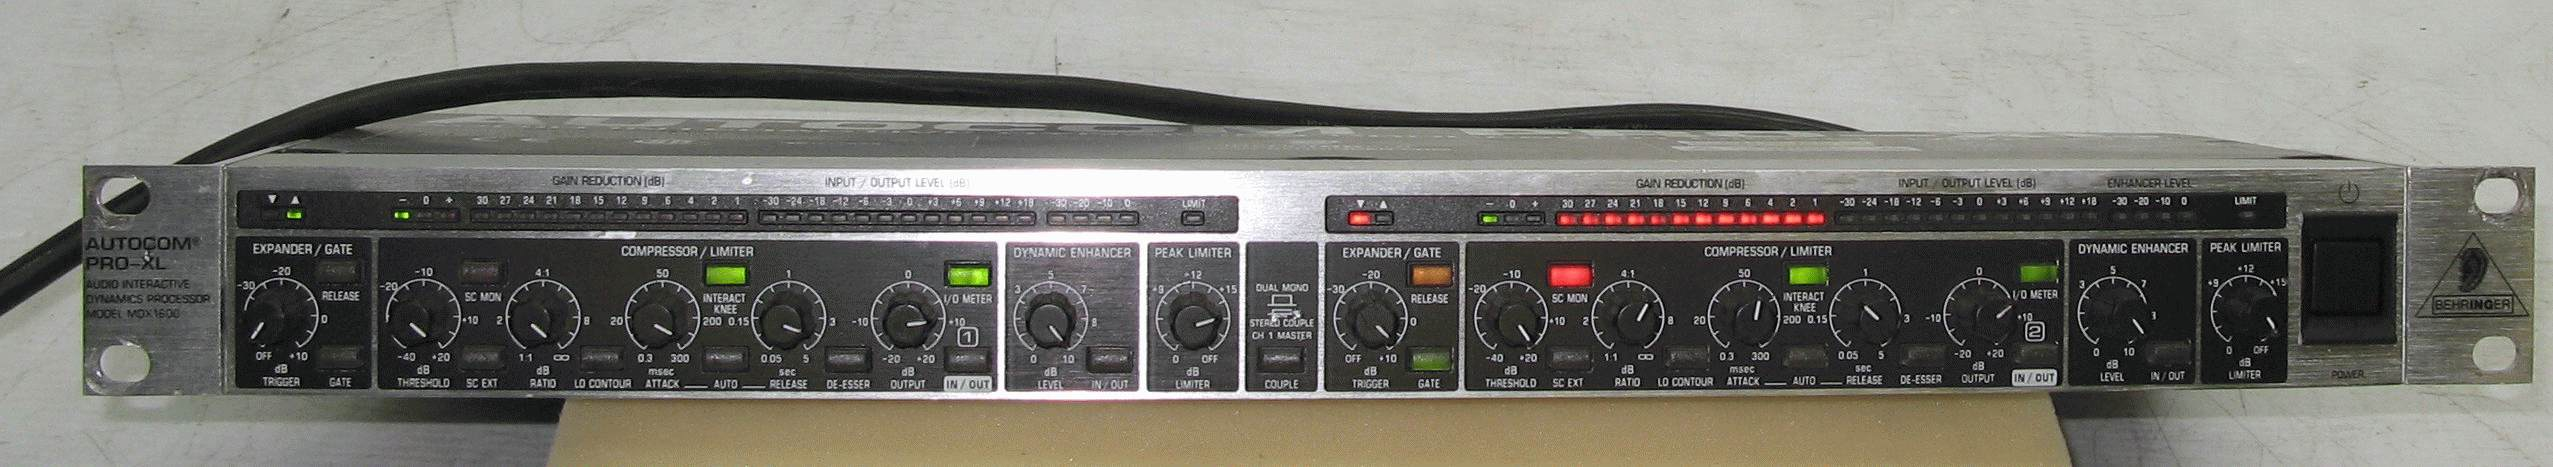 BEHRINGER AUTOCOM PRO-XL MDX1600 EPUB